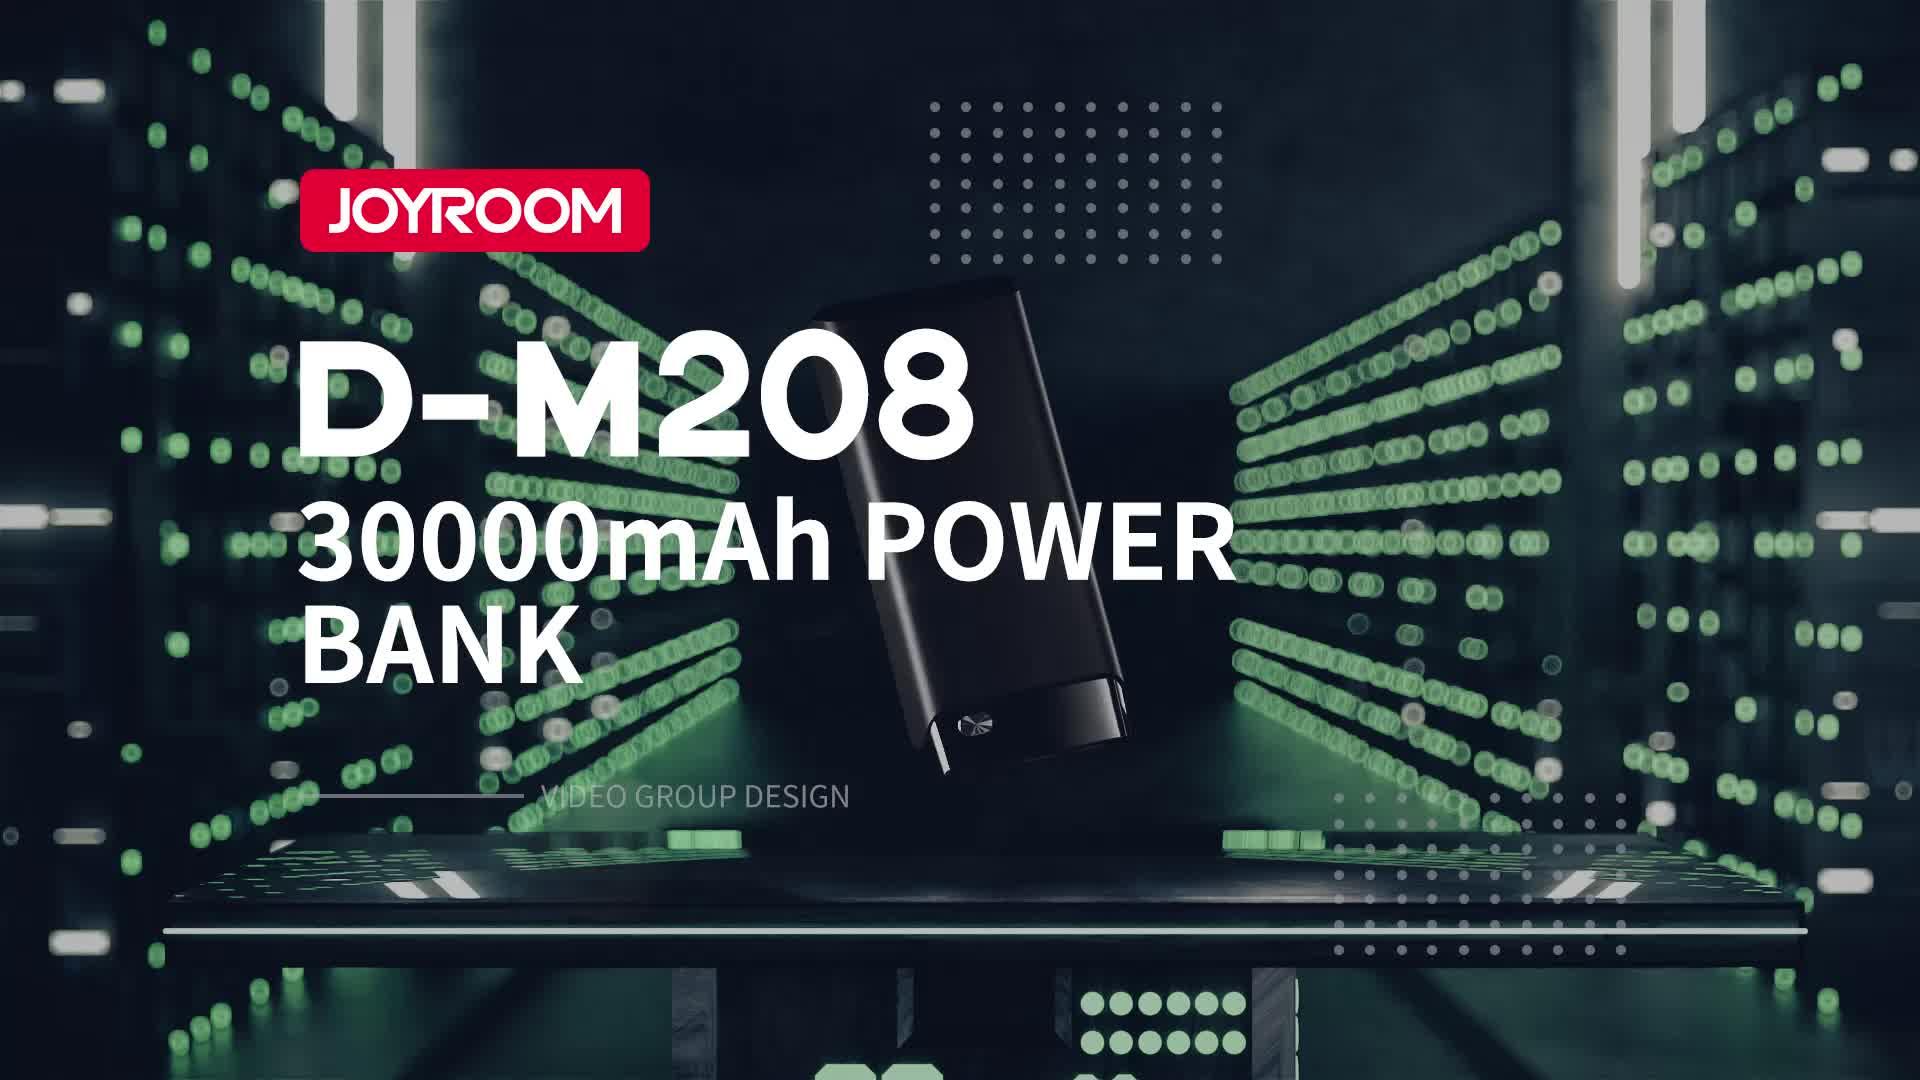 Joyroom 2019 new arrivals high capacity portable lithium power bank 30000mah